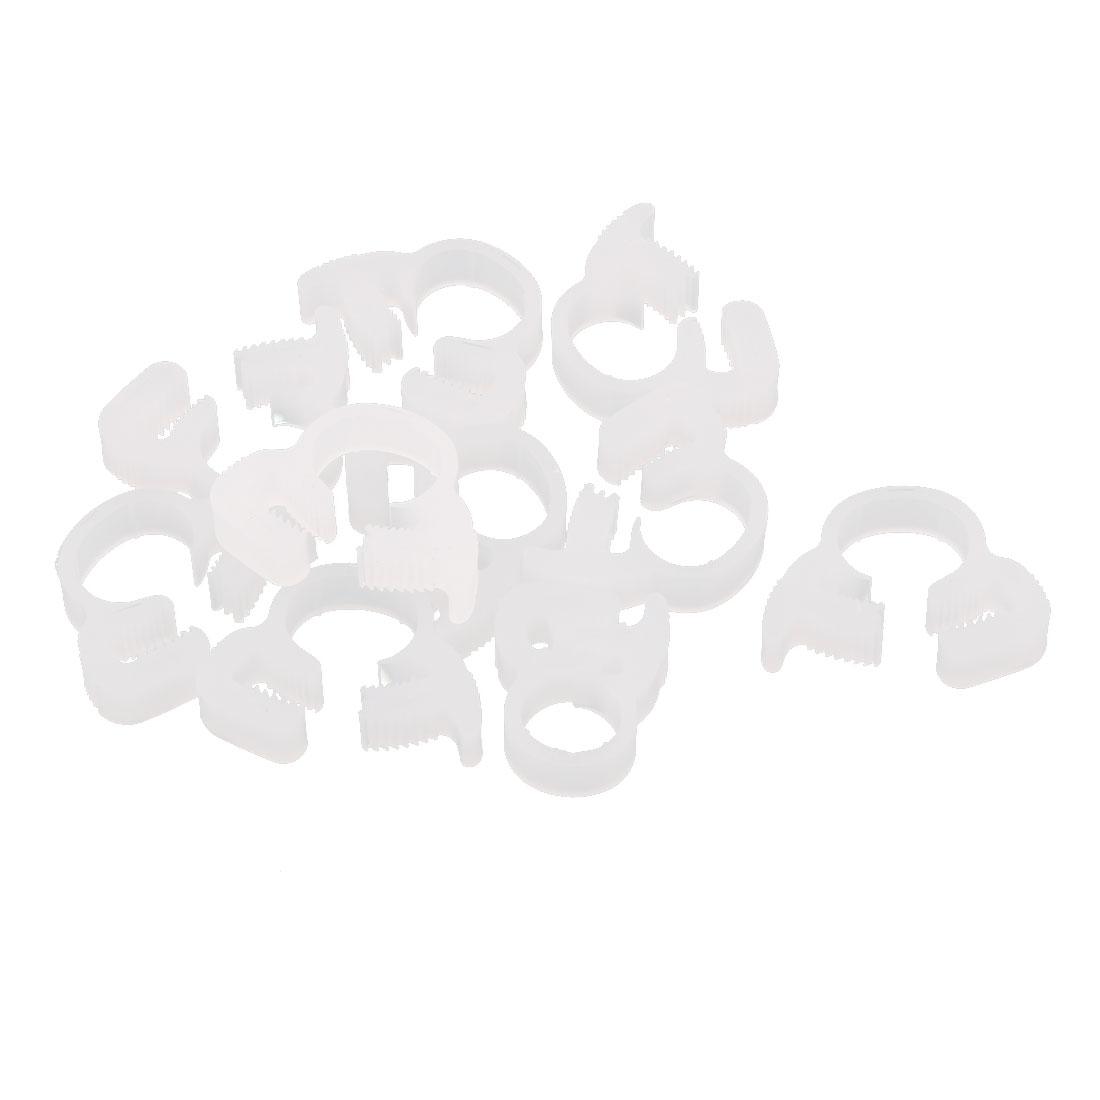 10 Pcs 7.6-8.1mm Range Plastic Adjustable Band Hose Pipe Fastener Clamp